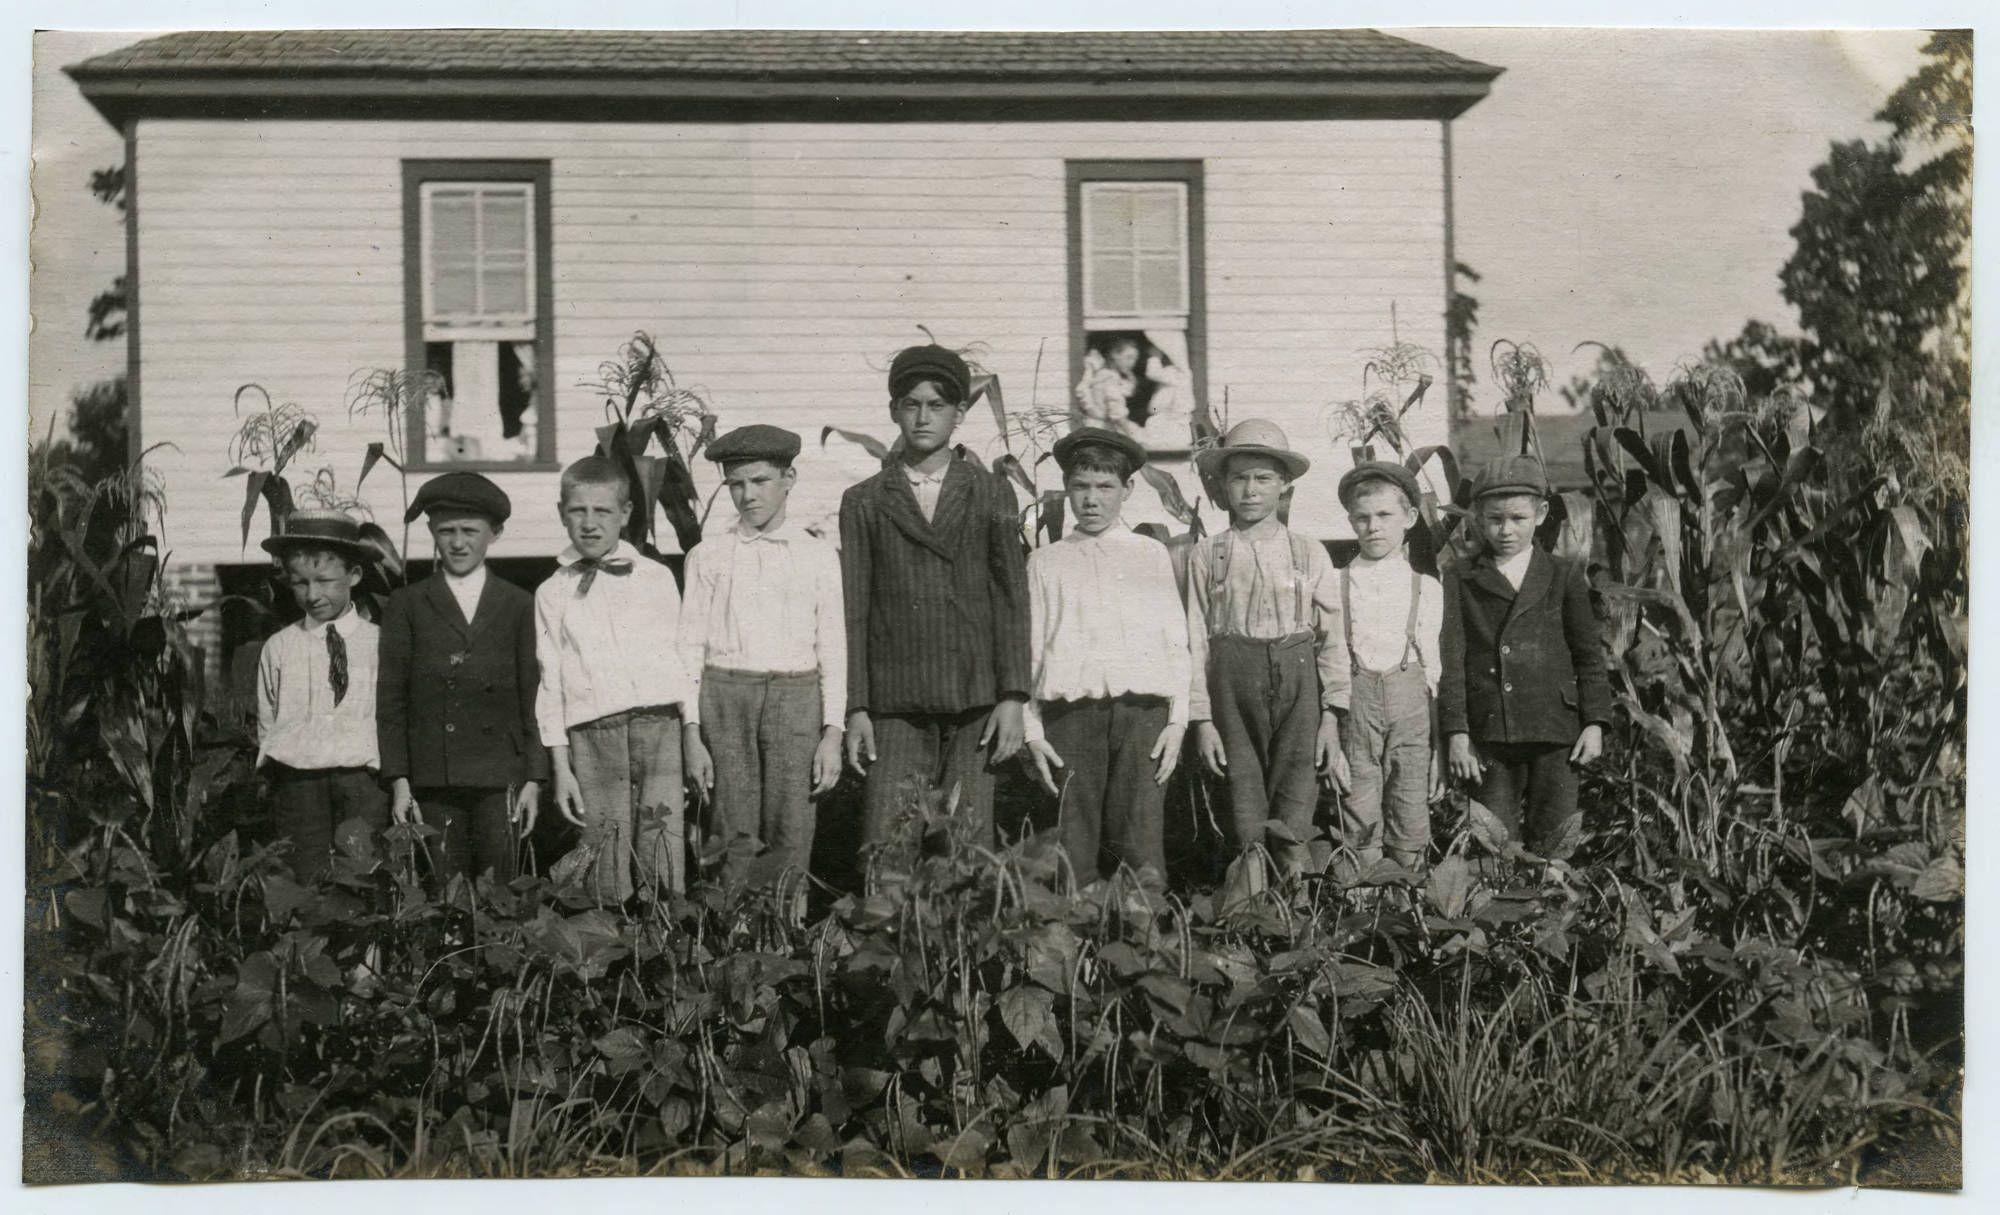 A group of nine boys, student age, pose in a garden, circa 1900s.